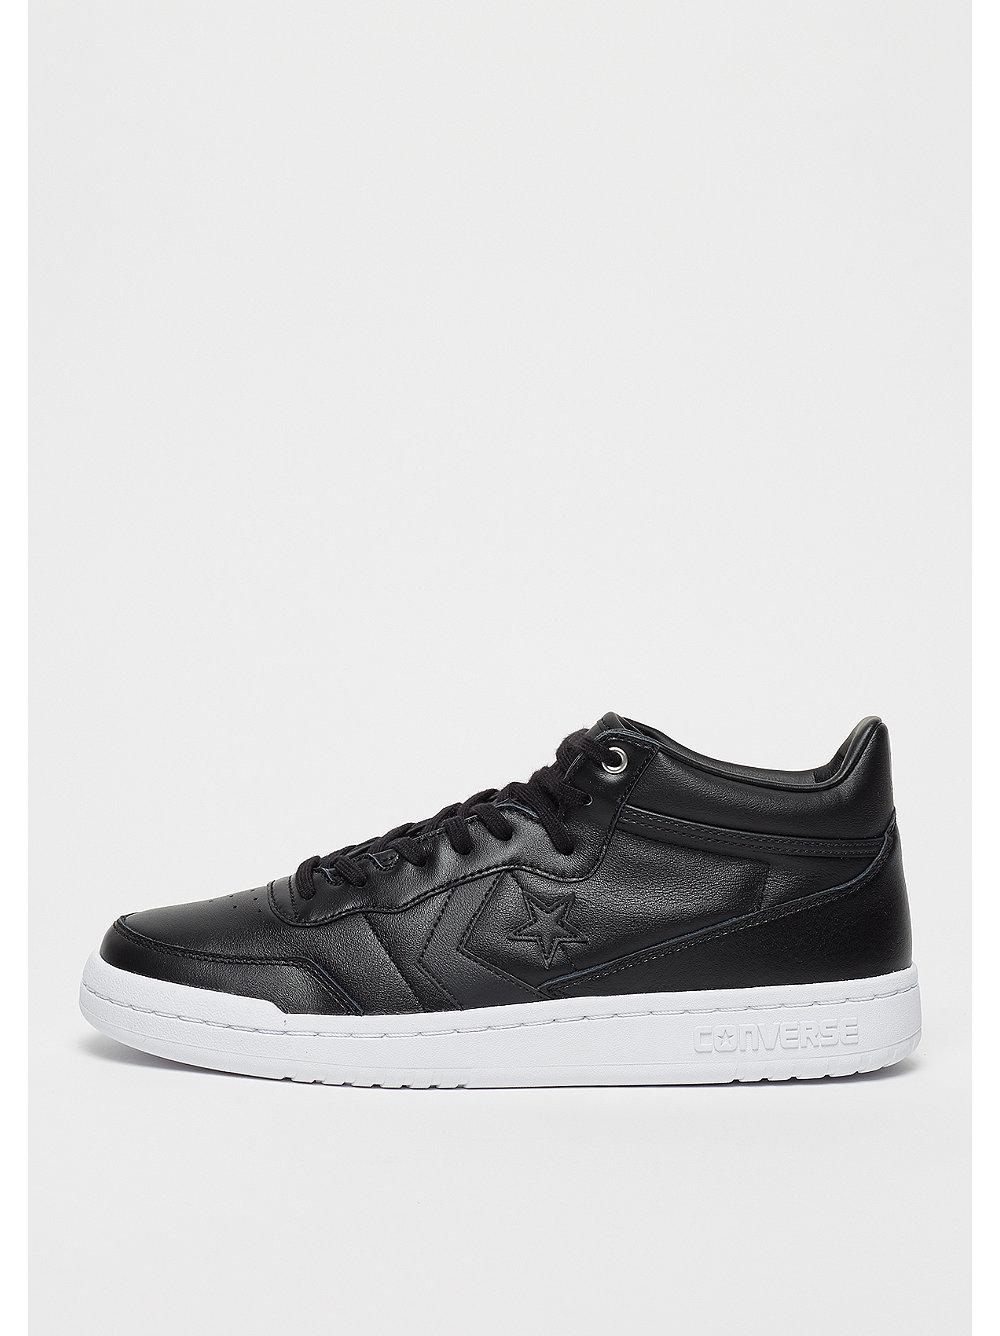 8cd60d13f883bd ... shoes converse fashion sale 5f5fe 57f1a  order converse fastbreak mid  black almost black white 95ea7 a87bf